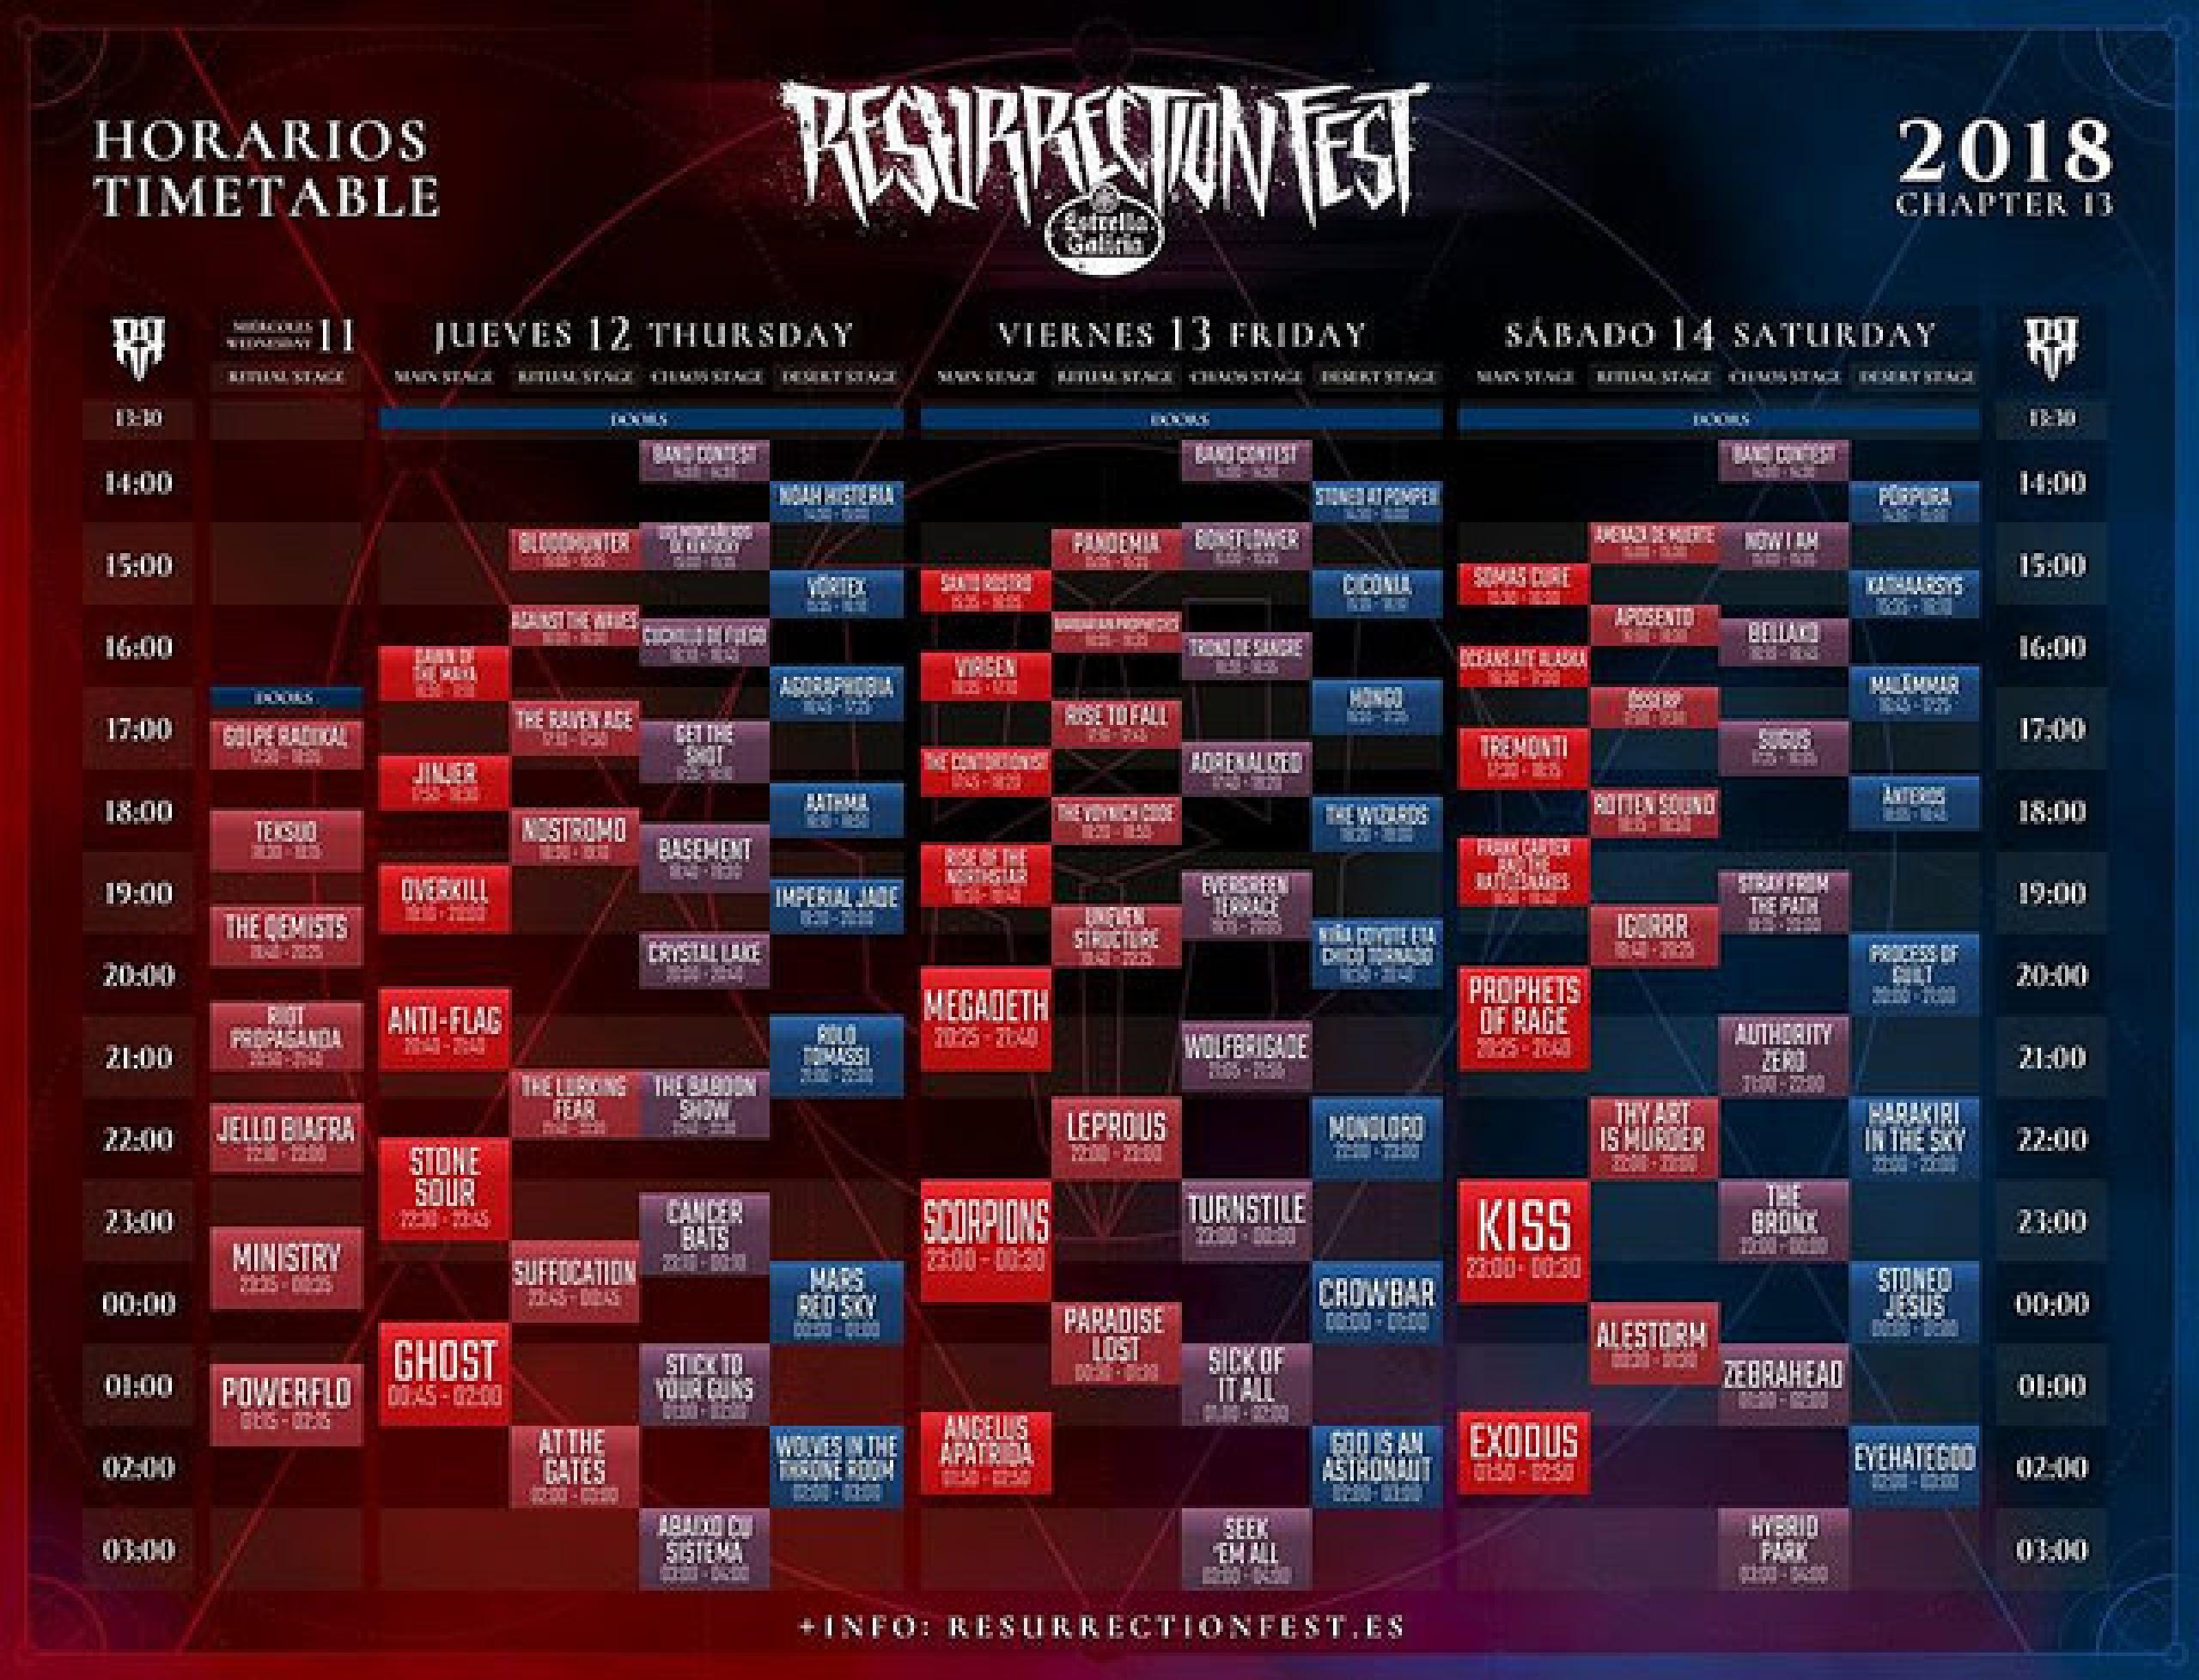 Horarios Resurrection Fest 2018